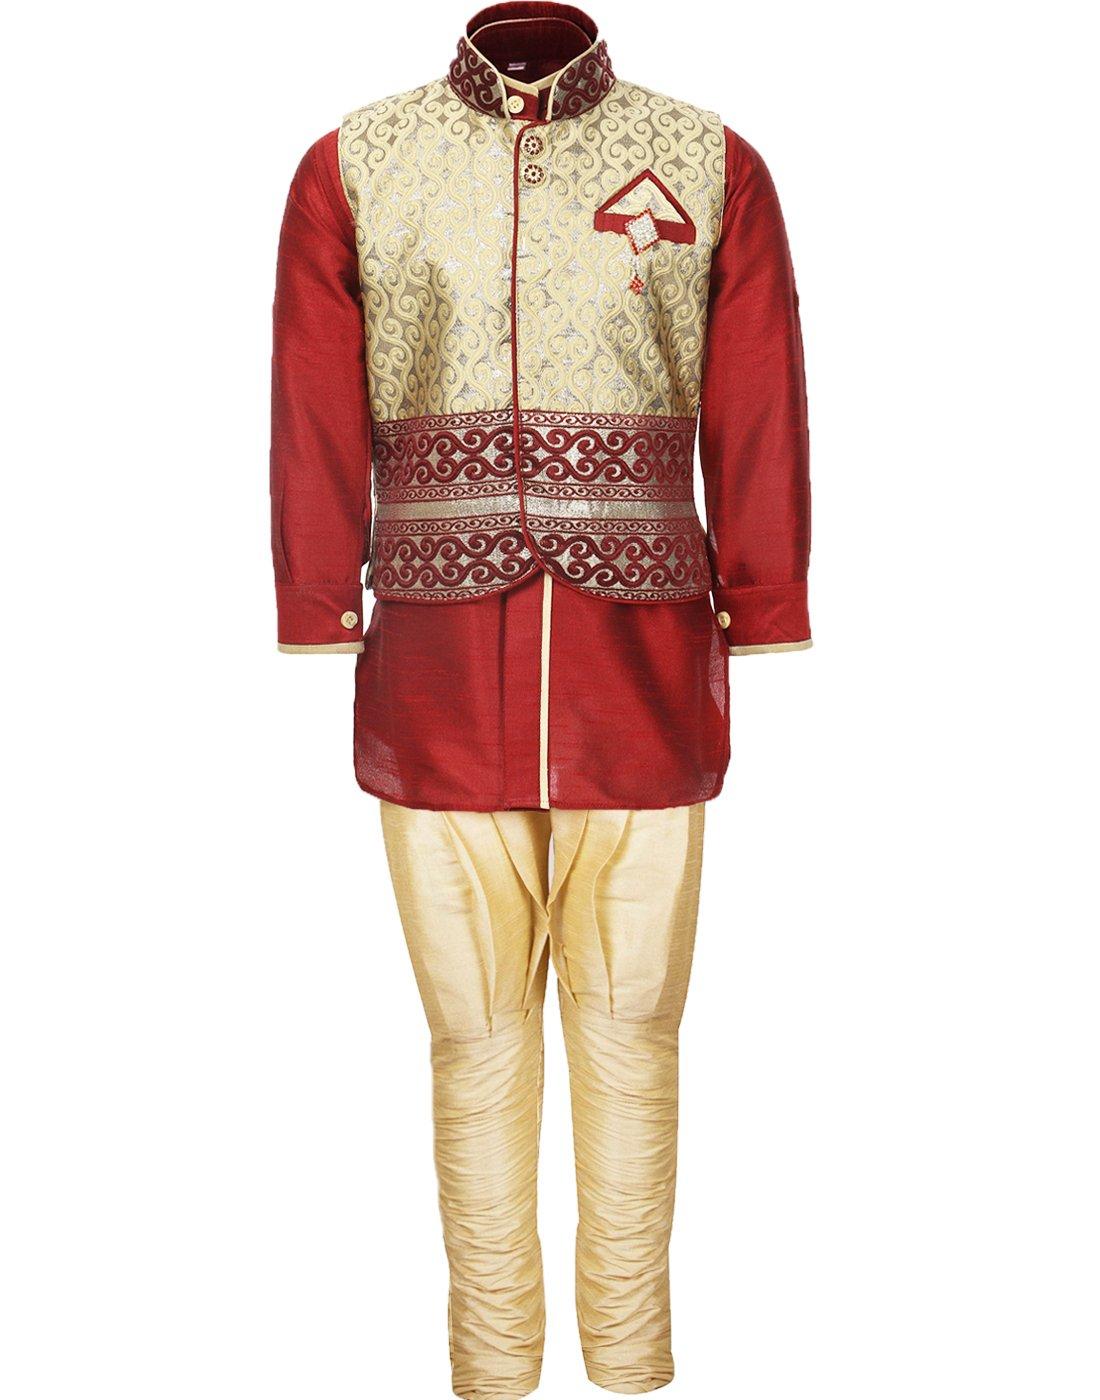 AJ Dezines Kids Indian Wear Bollywood Style Kurta Pyjama Waistcoat for Baby Boys 636-BABY-$P